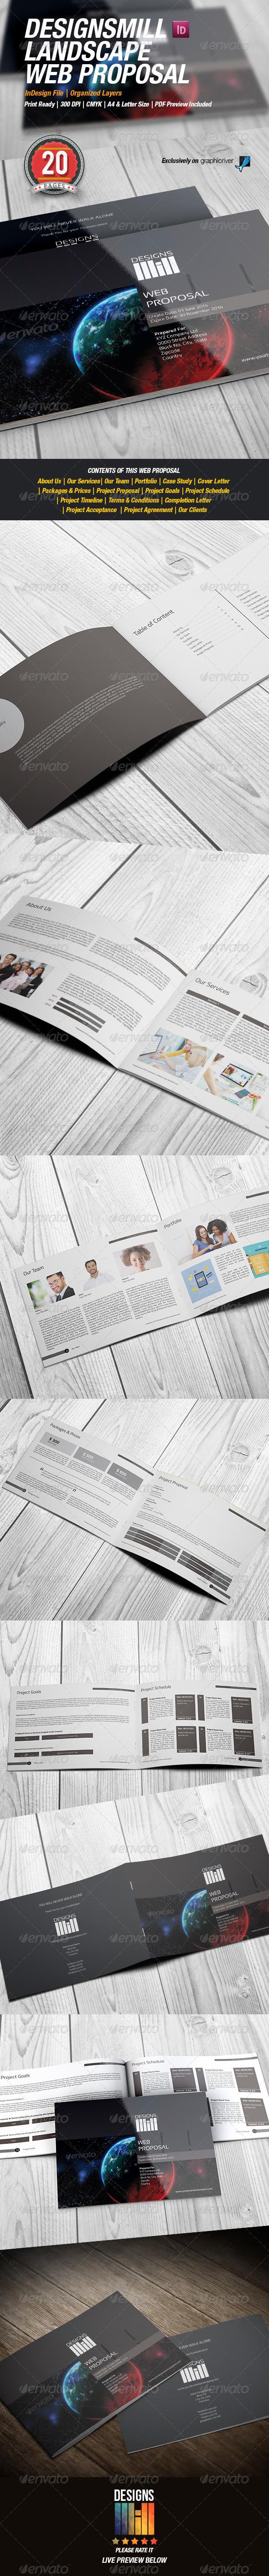 GraphicRiver DesignsMill Landscape Web Proposal 8550902